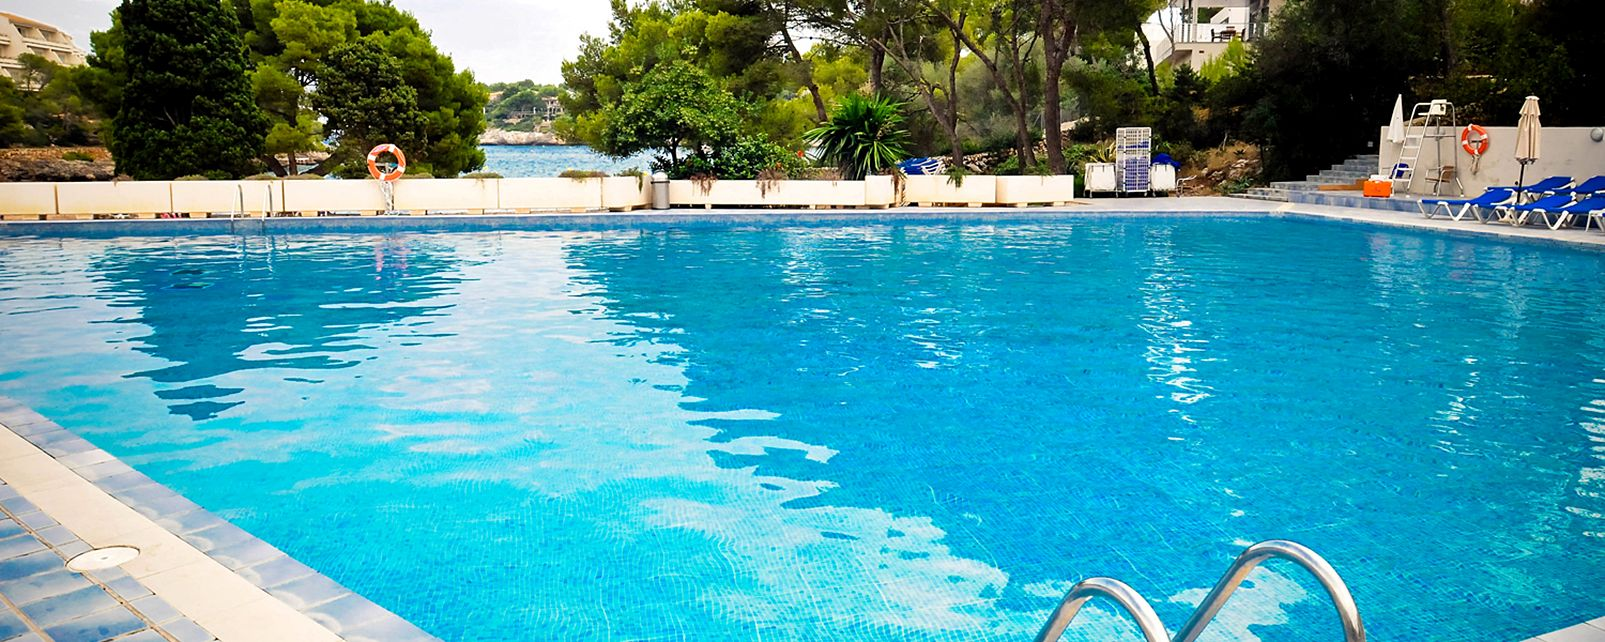 Hotel Puravida Blau Portopetro Beach Resort Spa